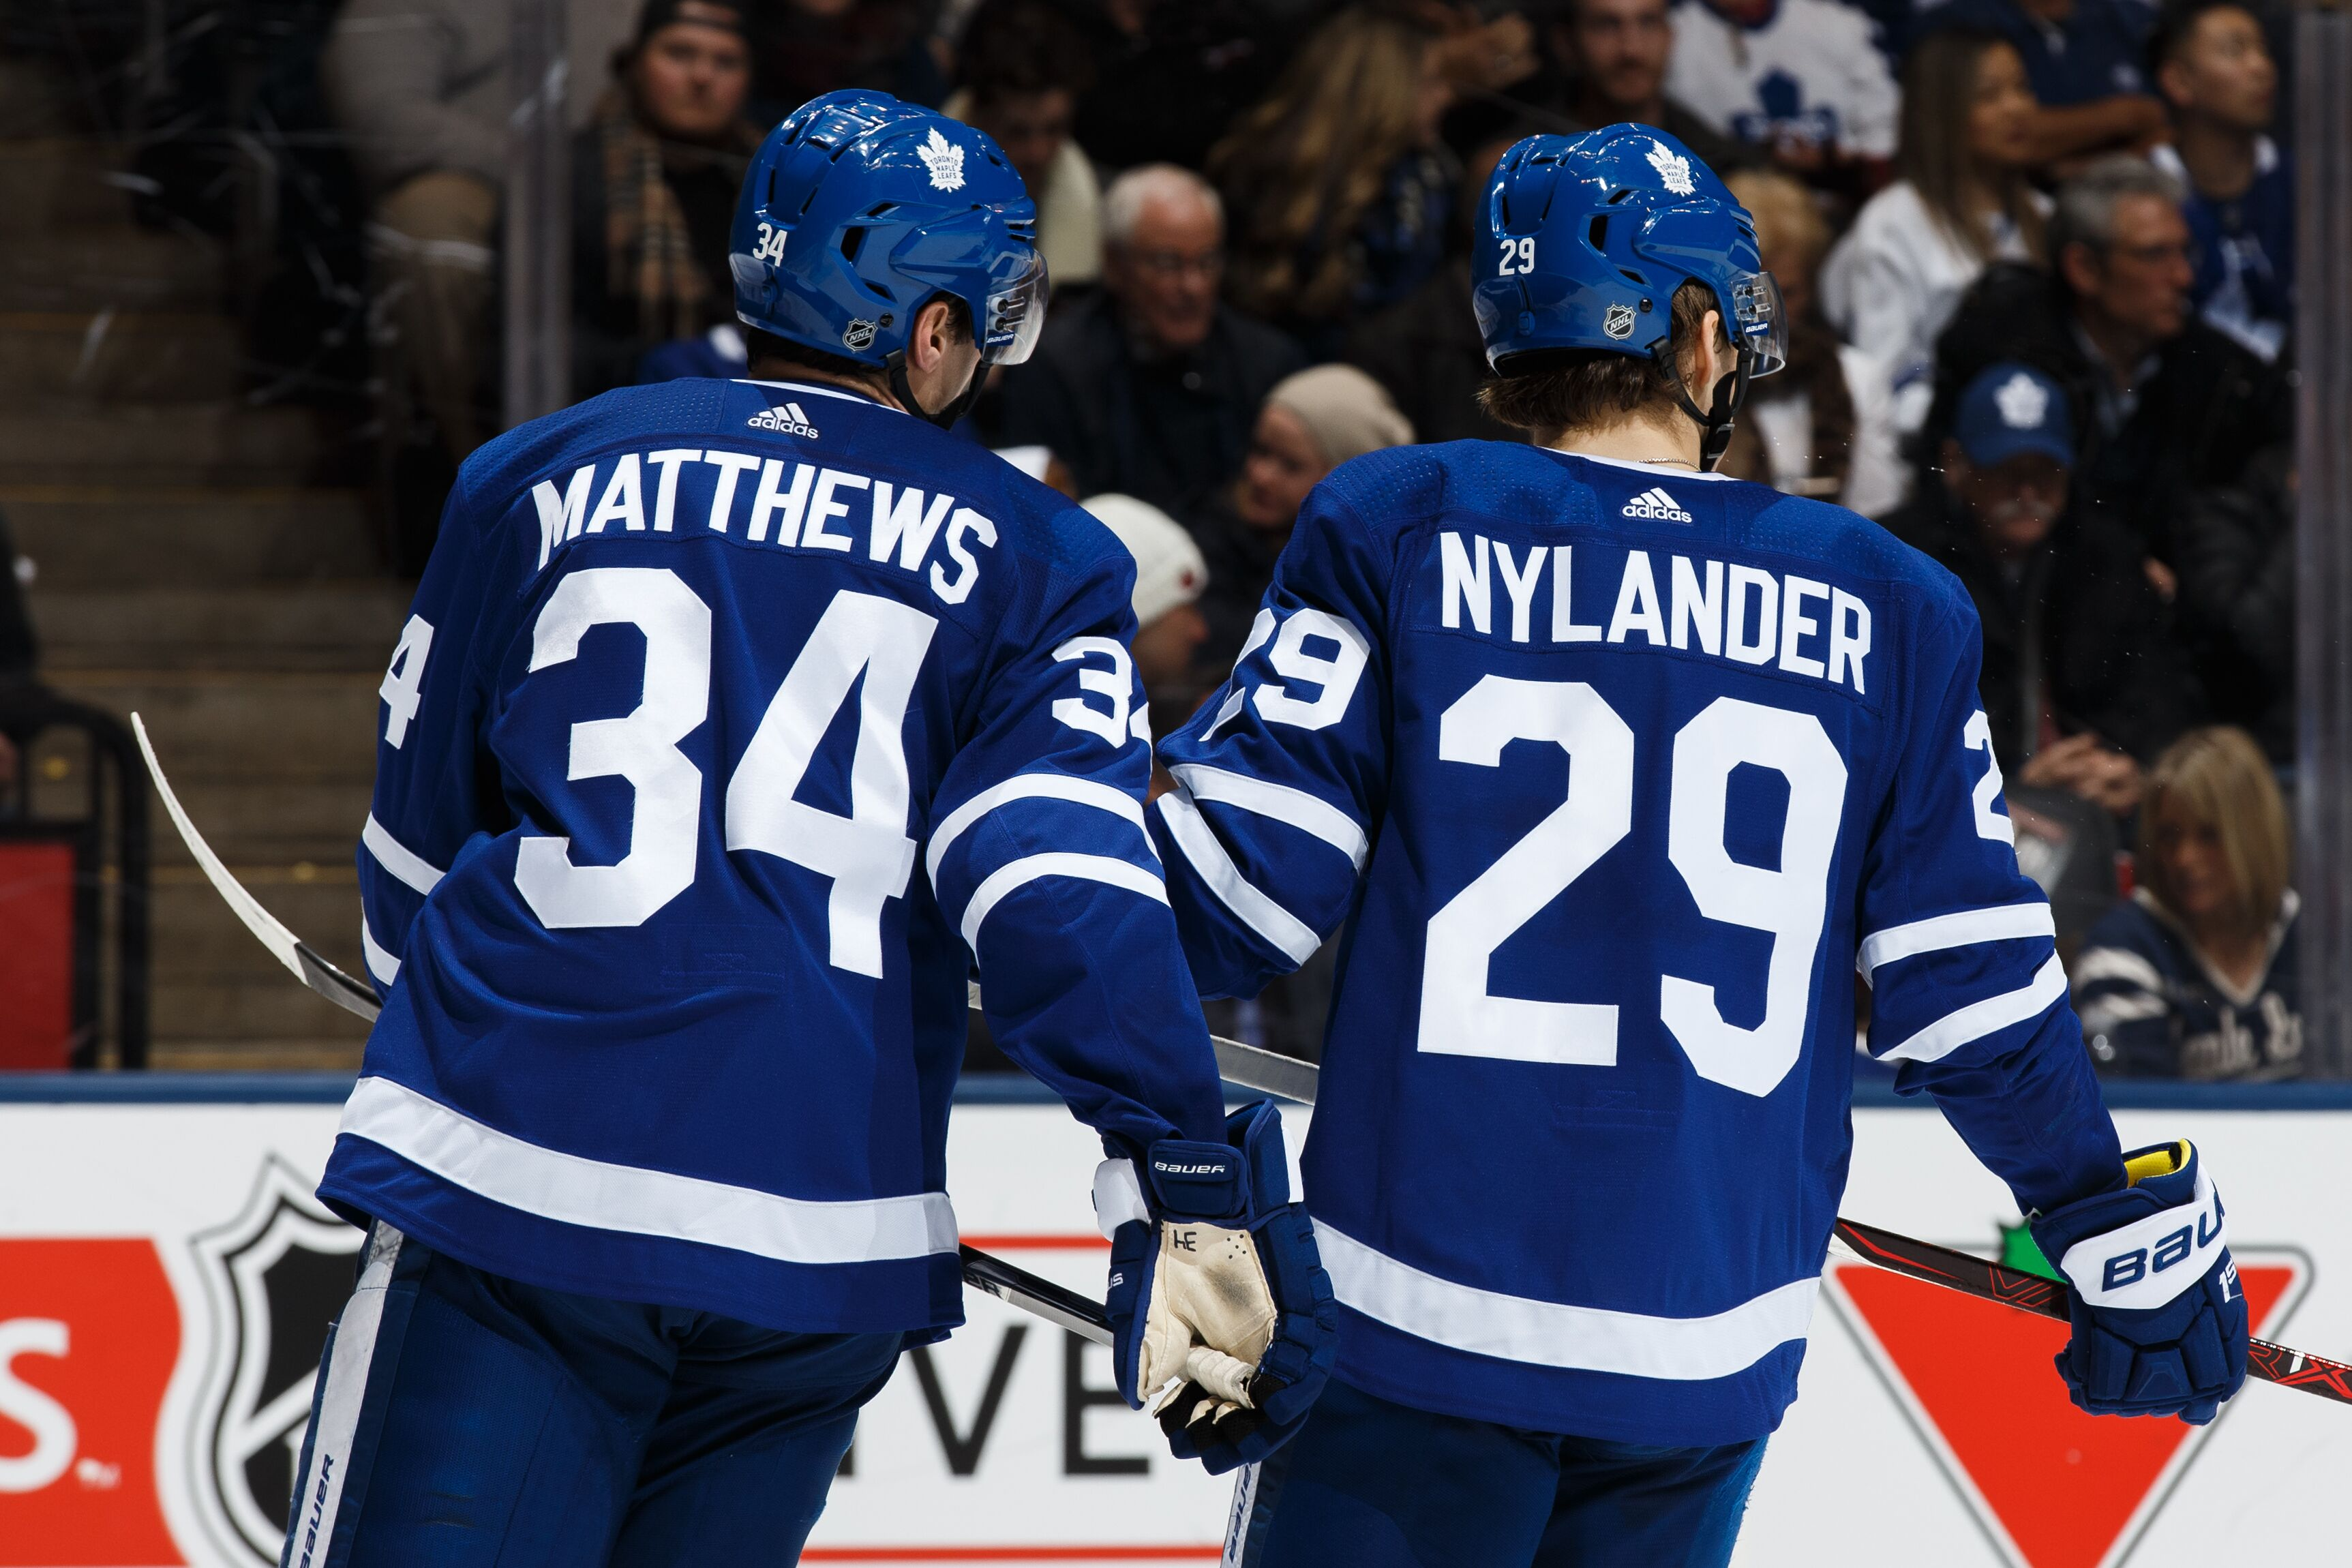 Toronto Maple Leafs: Pass on Weber for Nylander